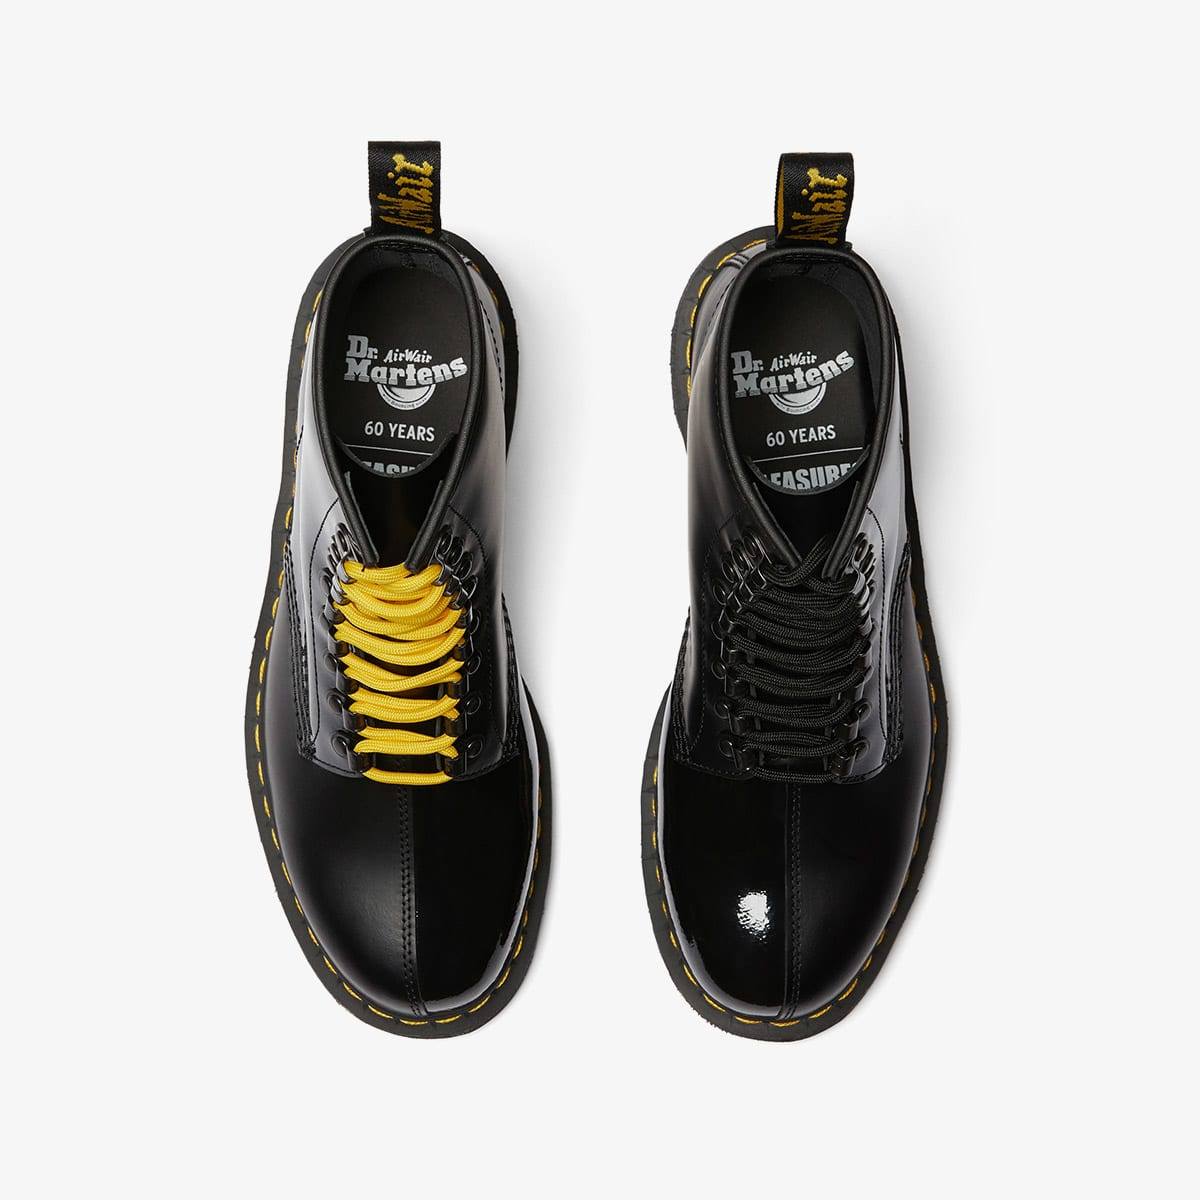 Dr. Martens x Pleasures 1460 Boot - 25985001